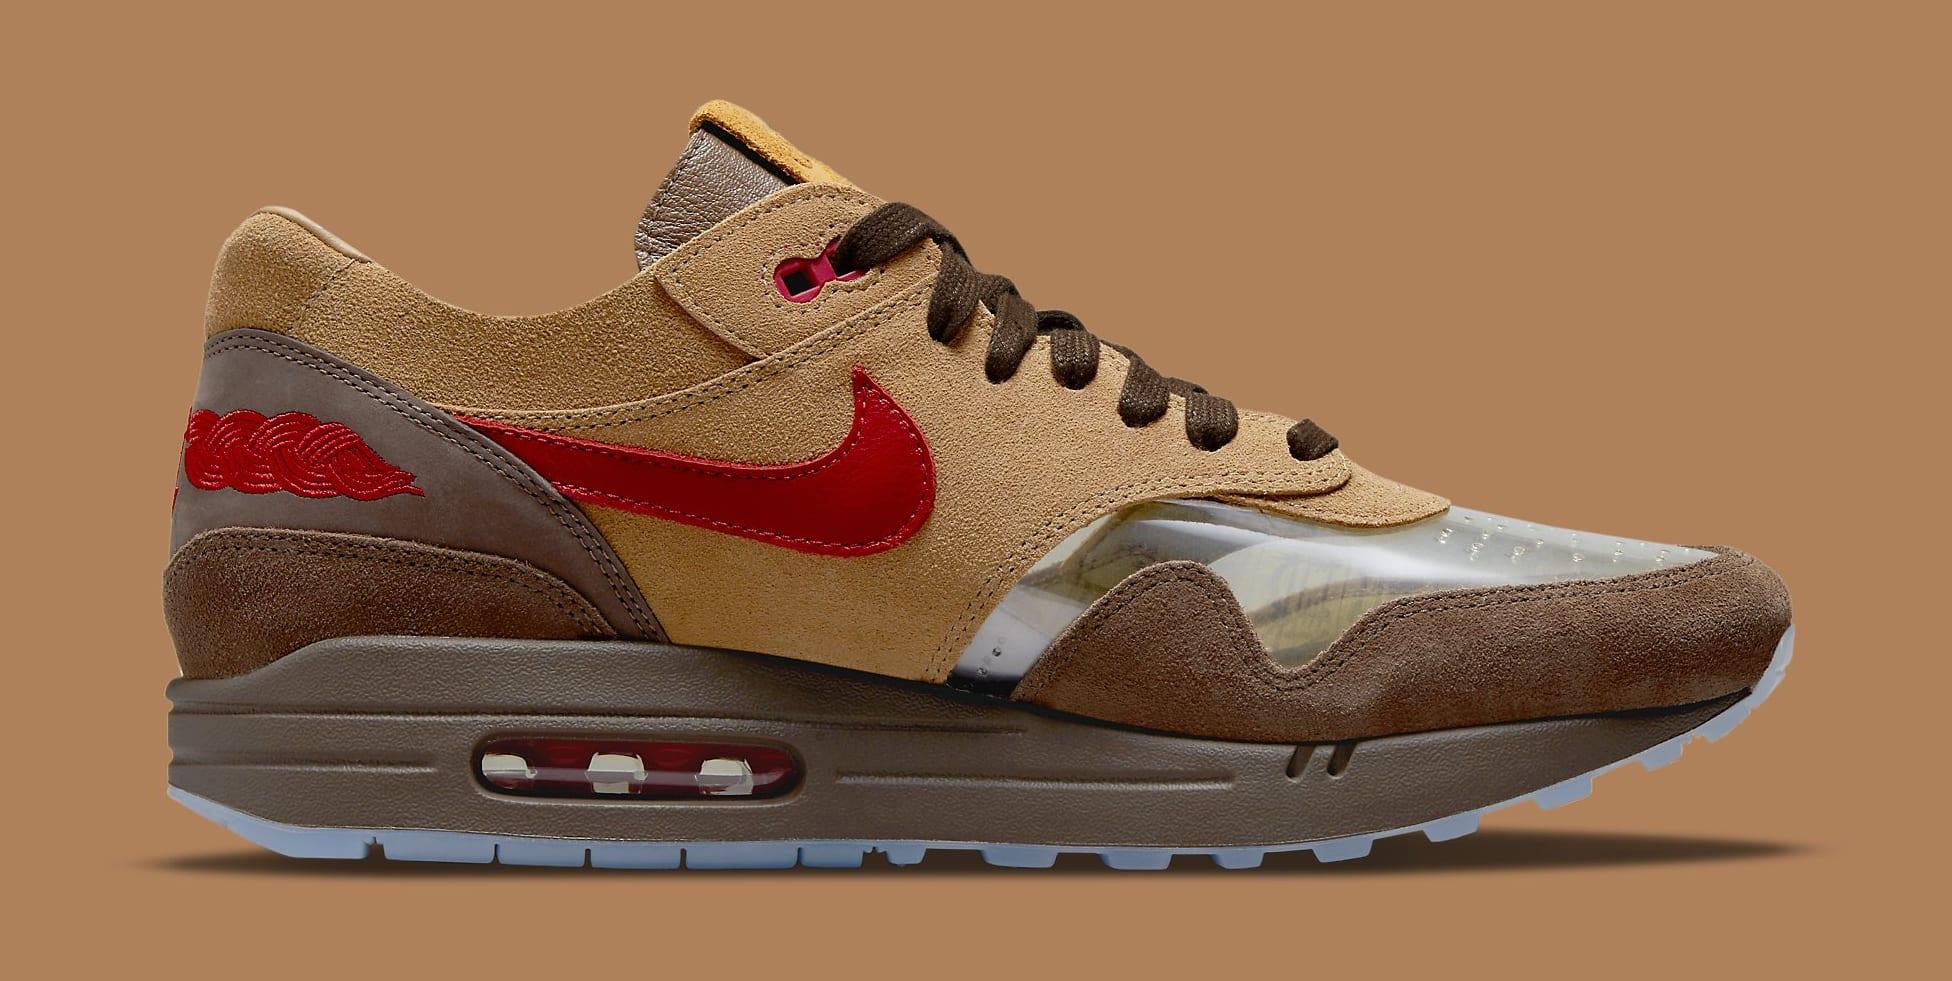 Clot x Nike Air Max 1 'K.O.D. - CHA' DD1870-200 Medial